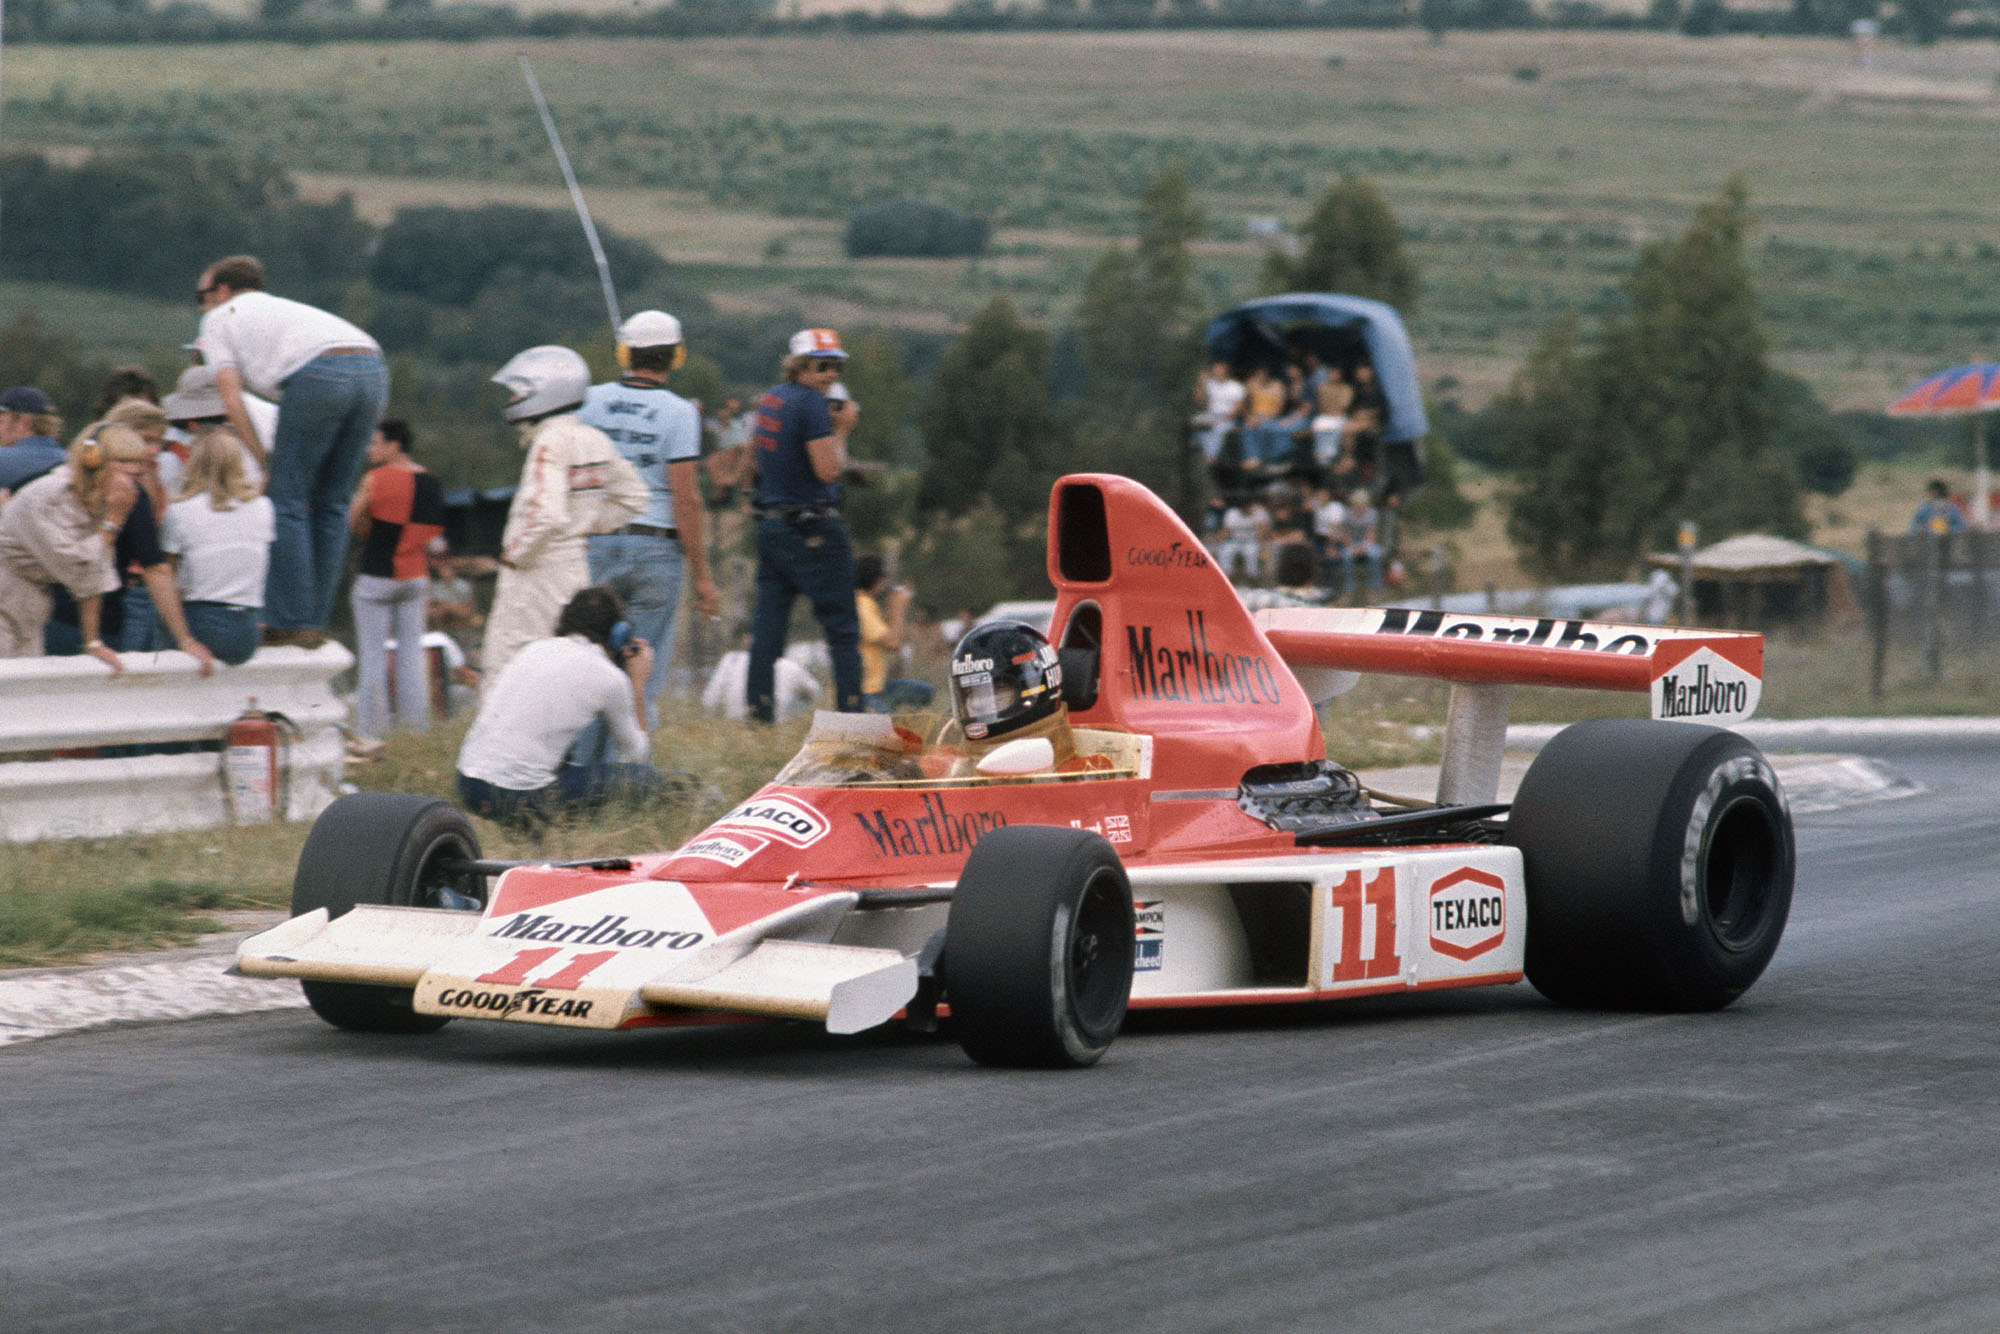 James Hunt (McLaren) dealing with oversteer at the South African Grand Prix, Kyalami.